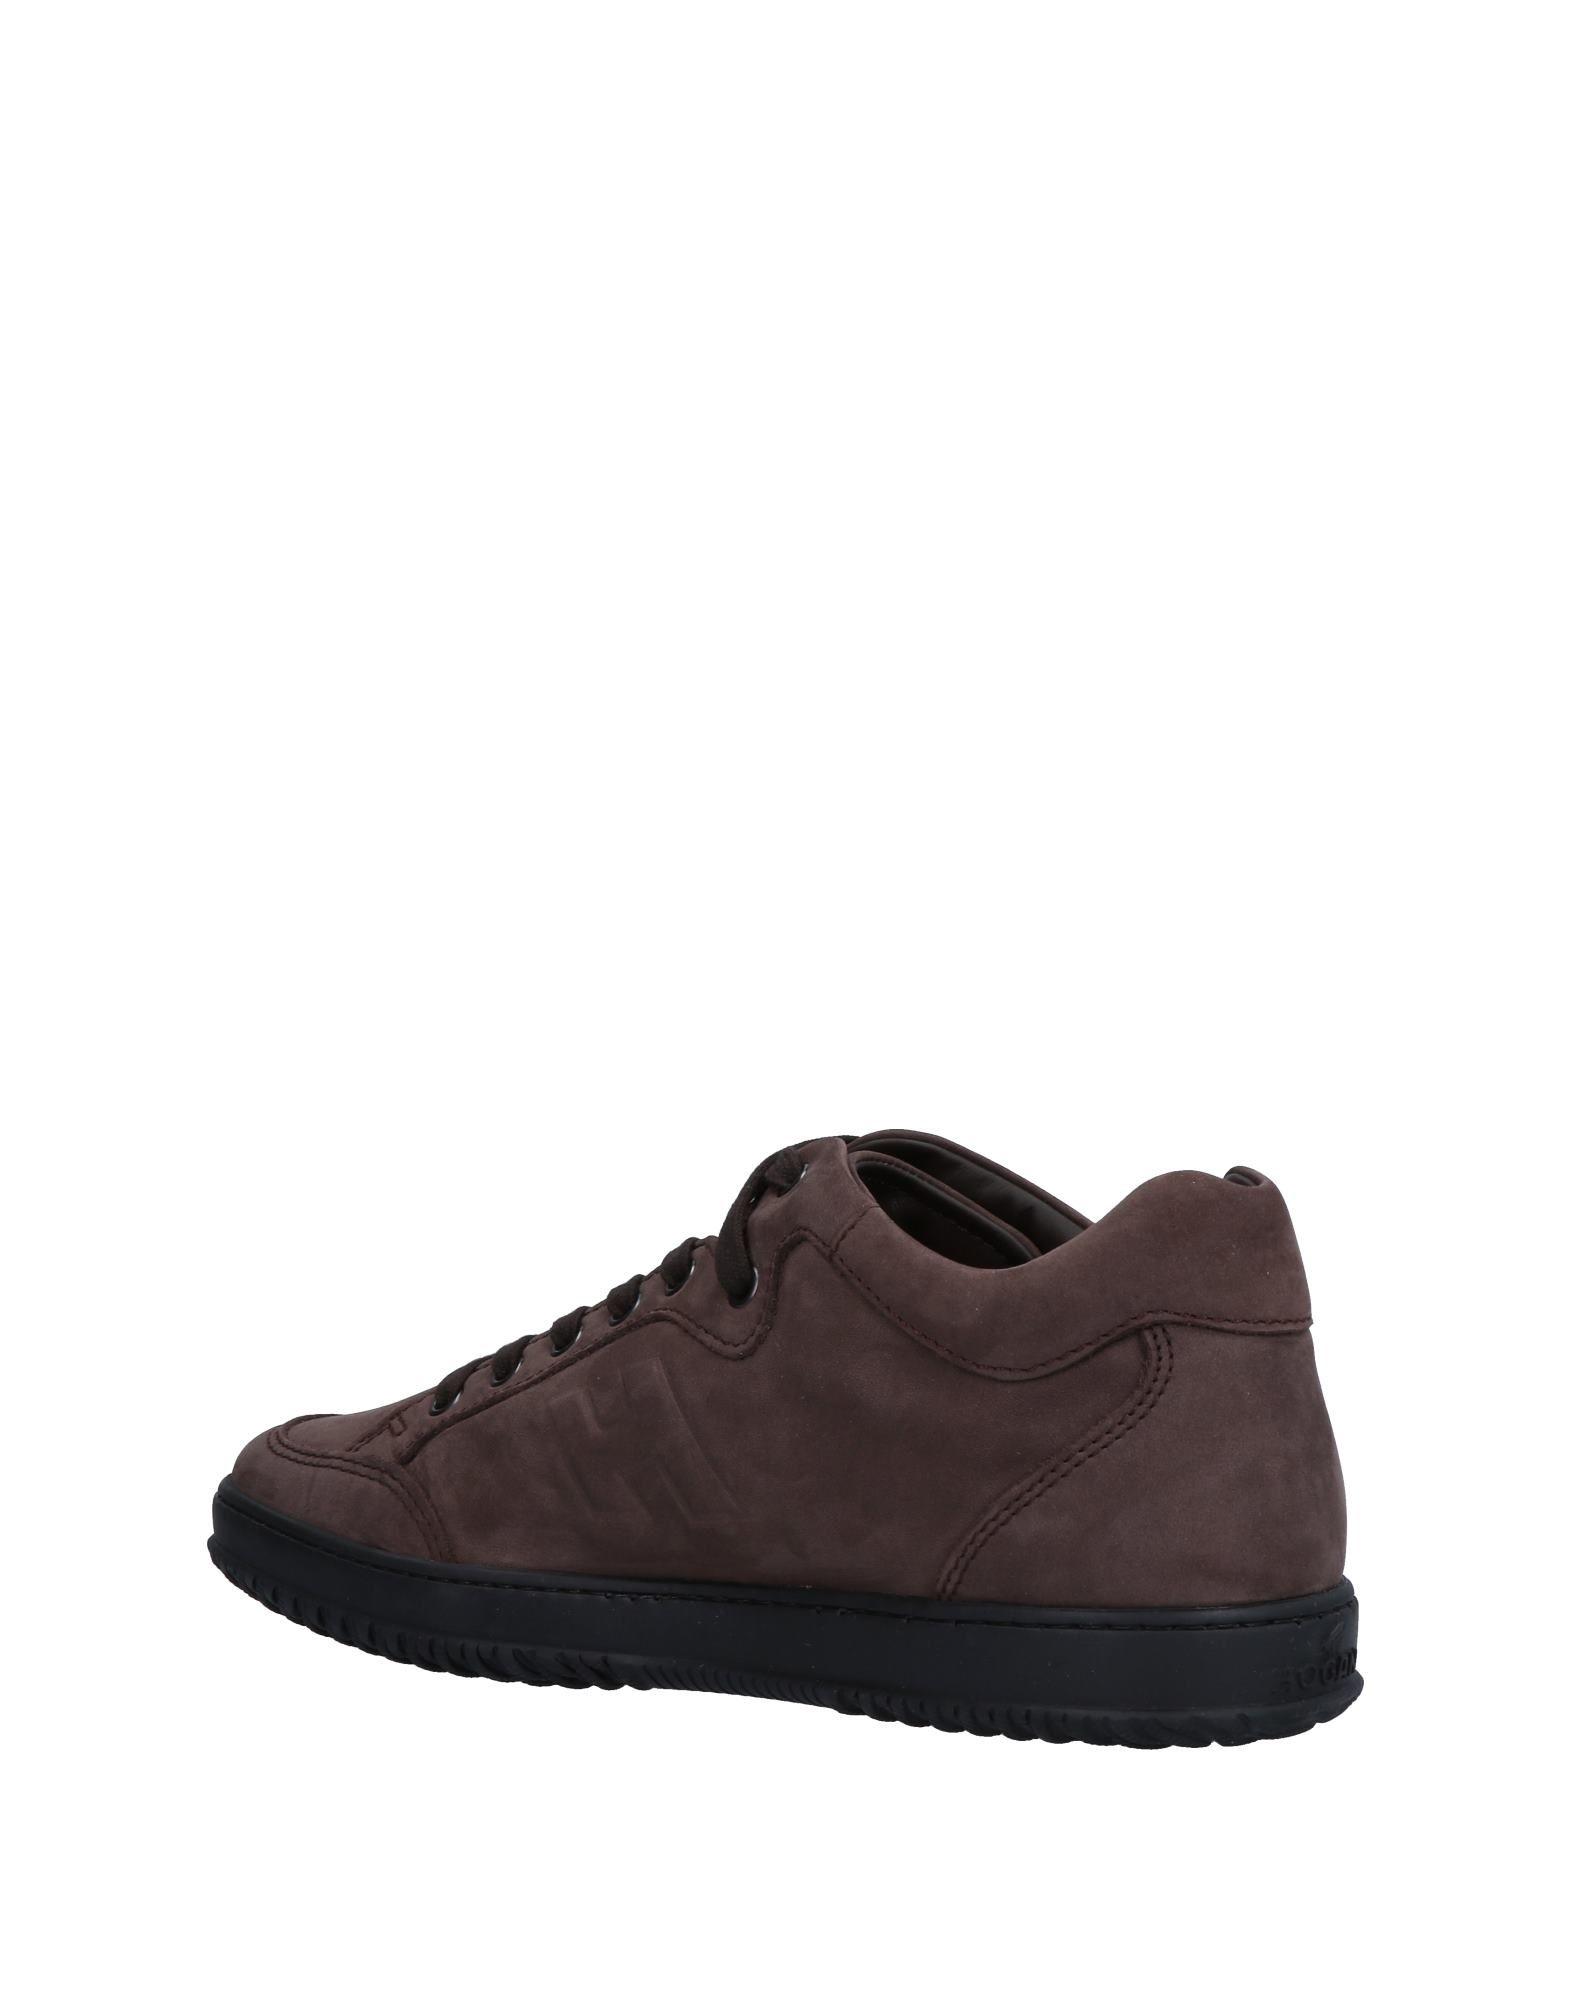 Hogan Sneakers Herren  11288440CX Gute Qualität beliebte Schuhe